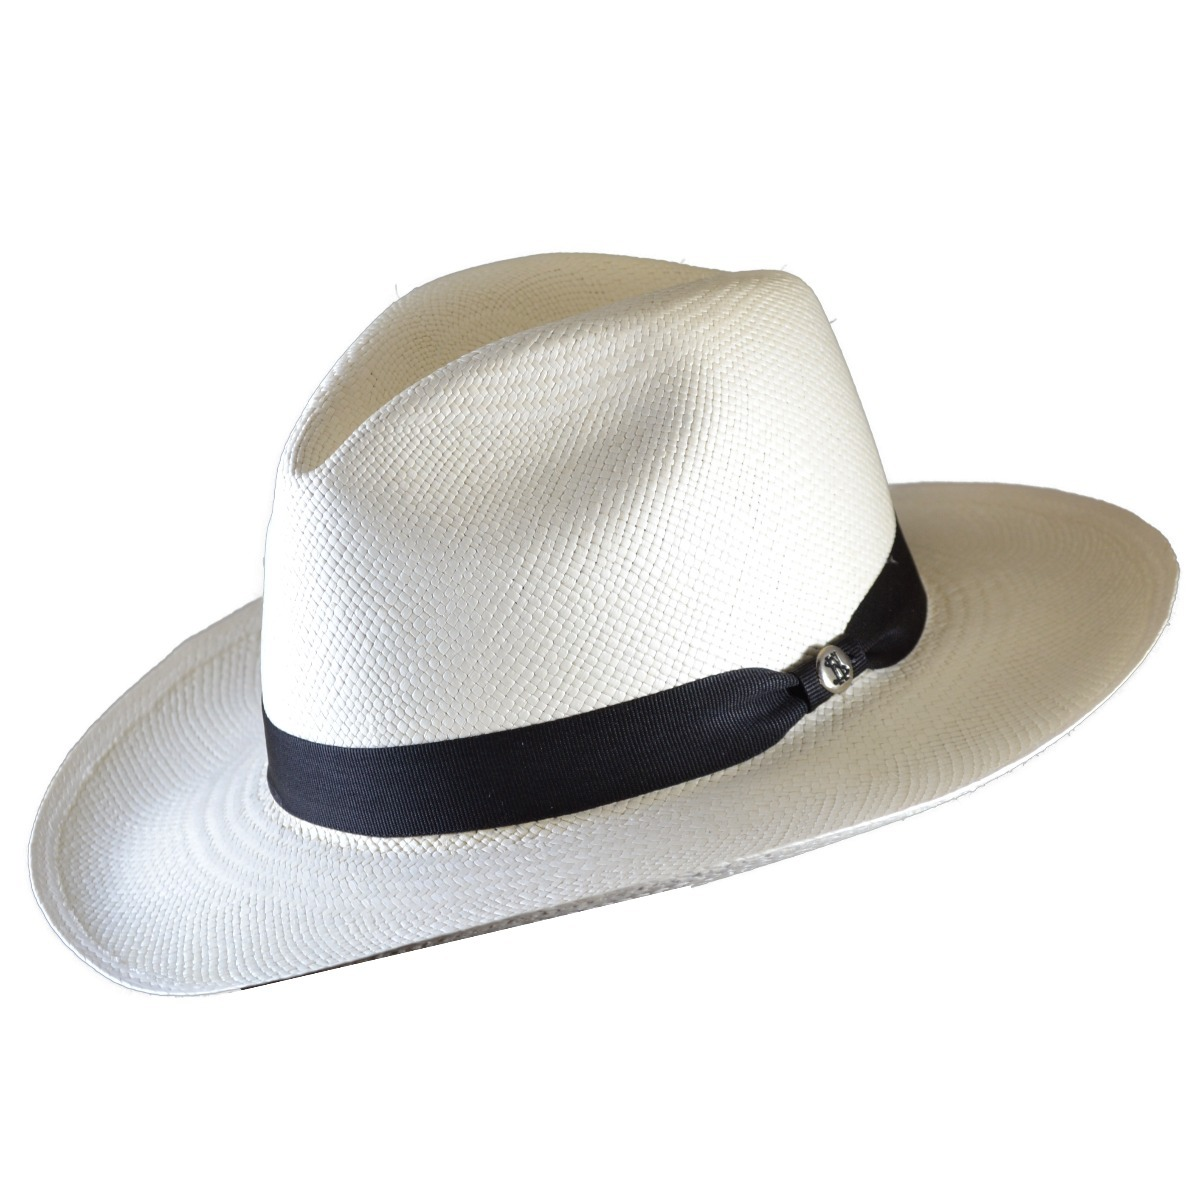 708db9635f937 sombrero panamá palma toquilla elegante fino. Cargando zoom.